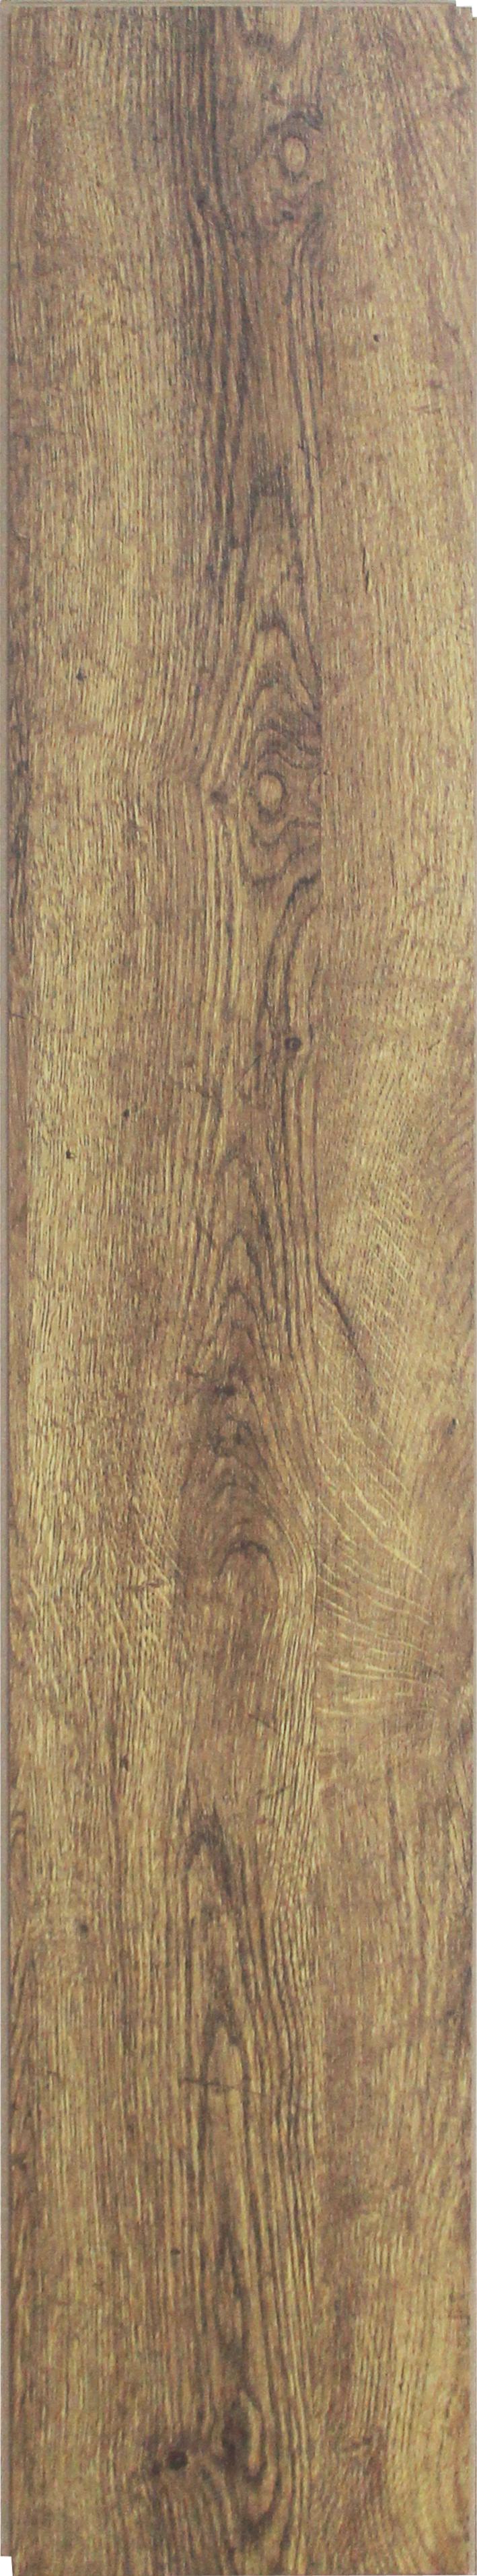 7664-Antique Harvest Oak